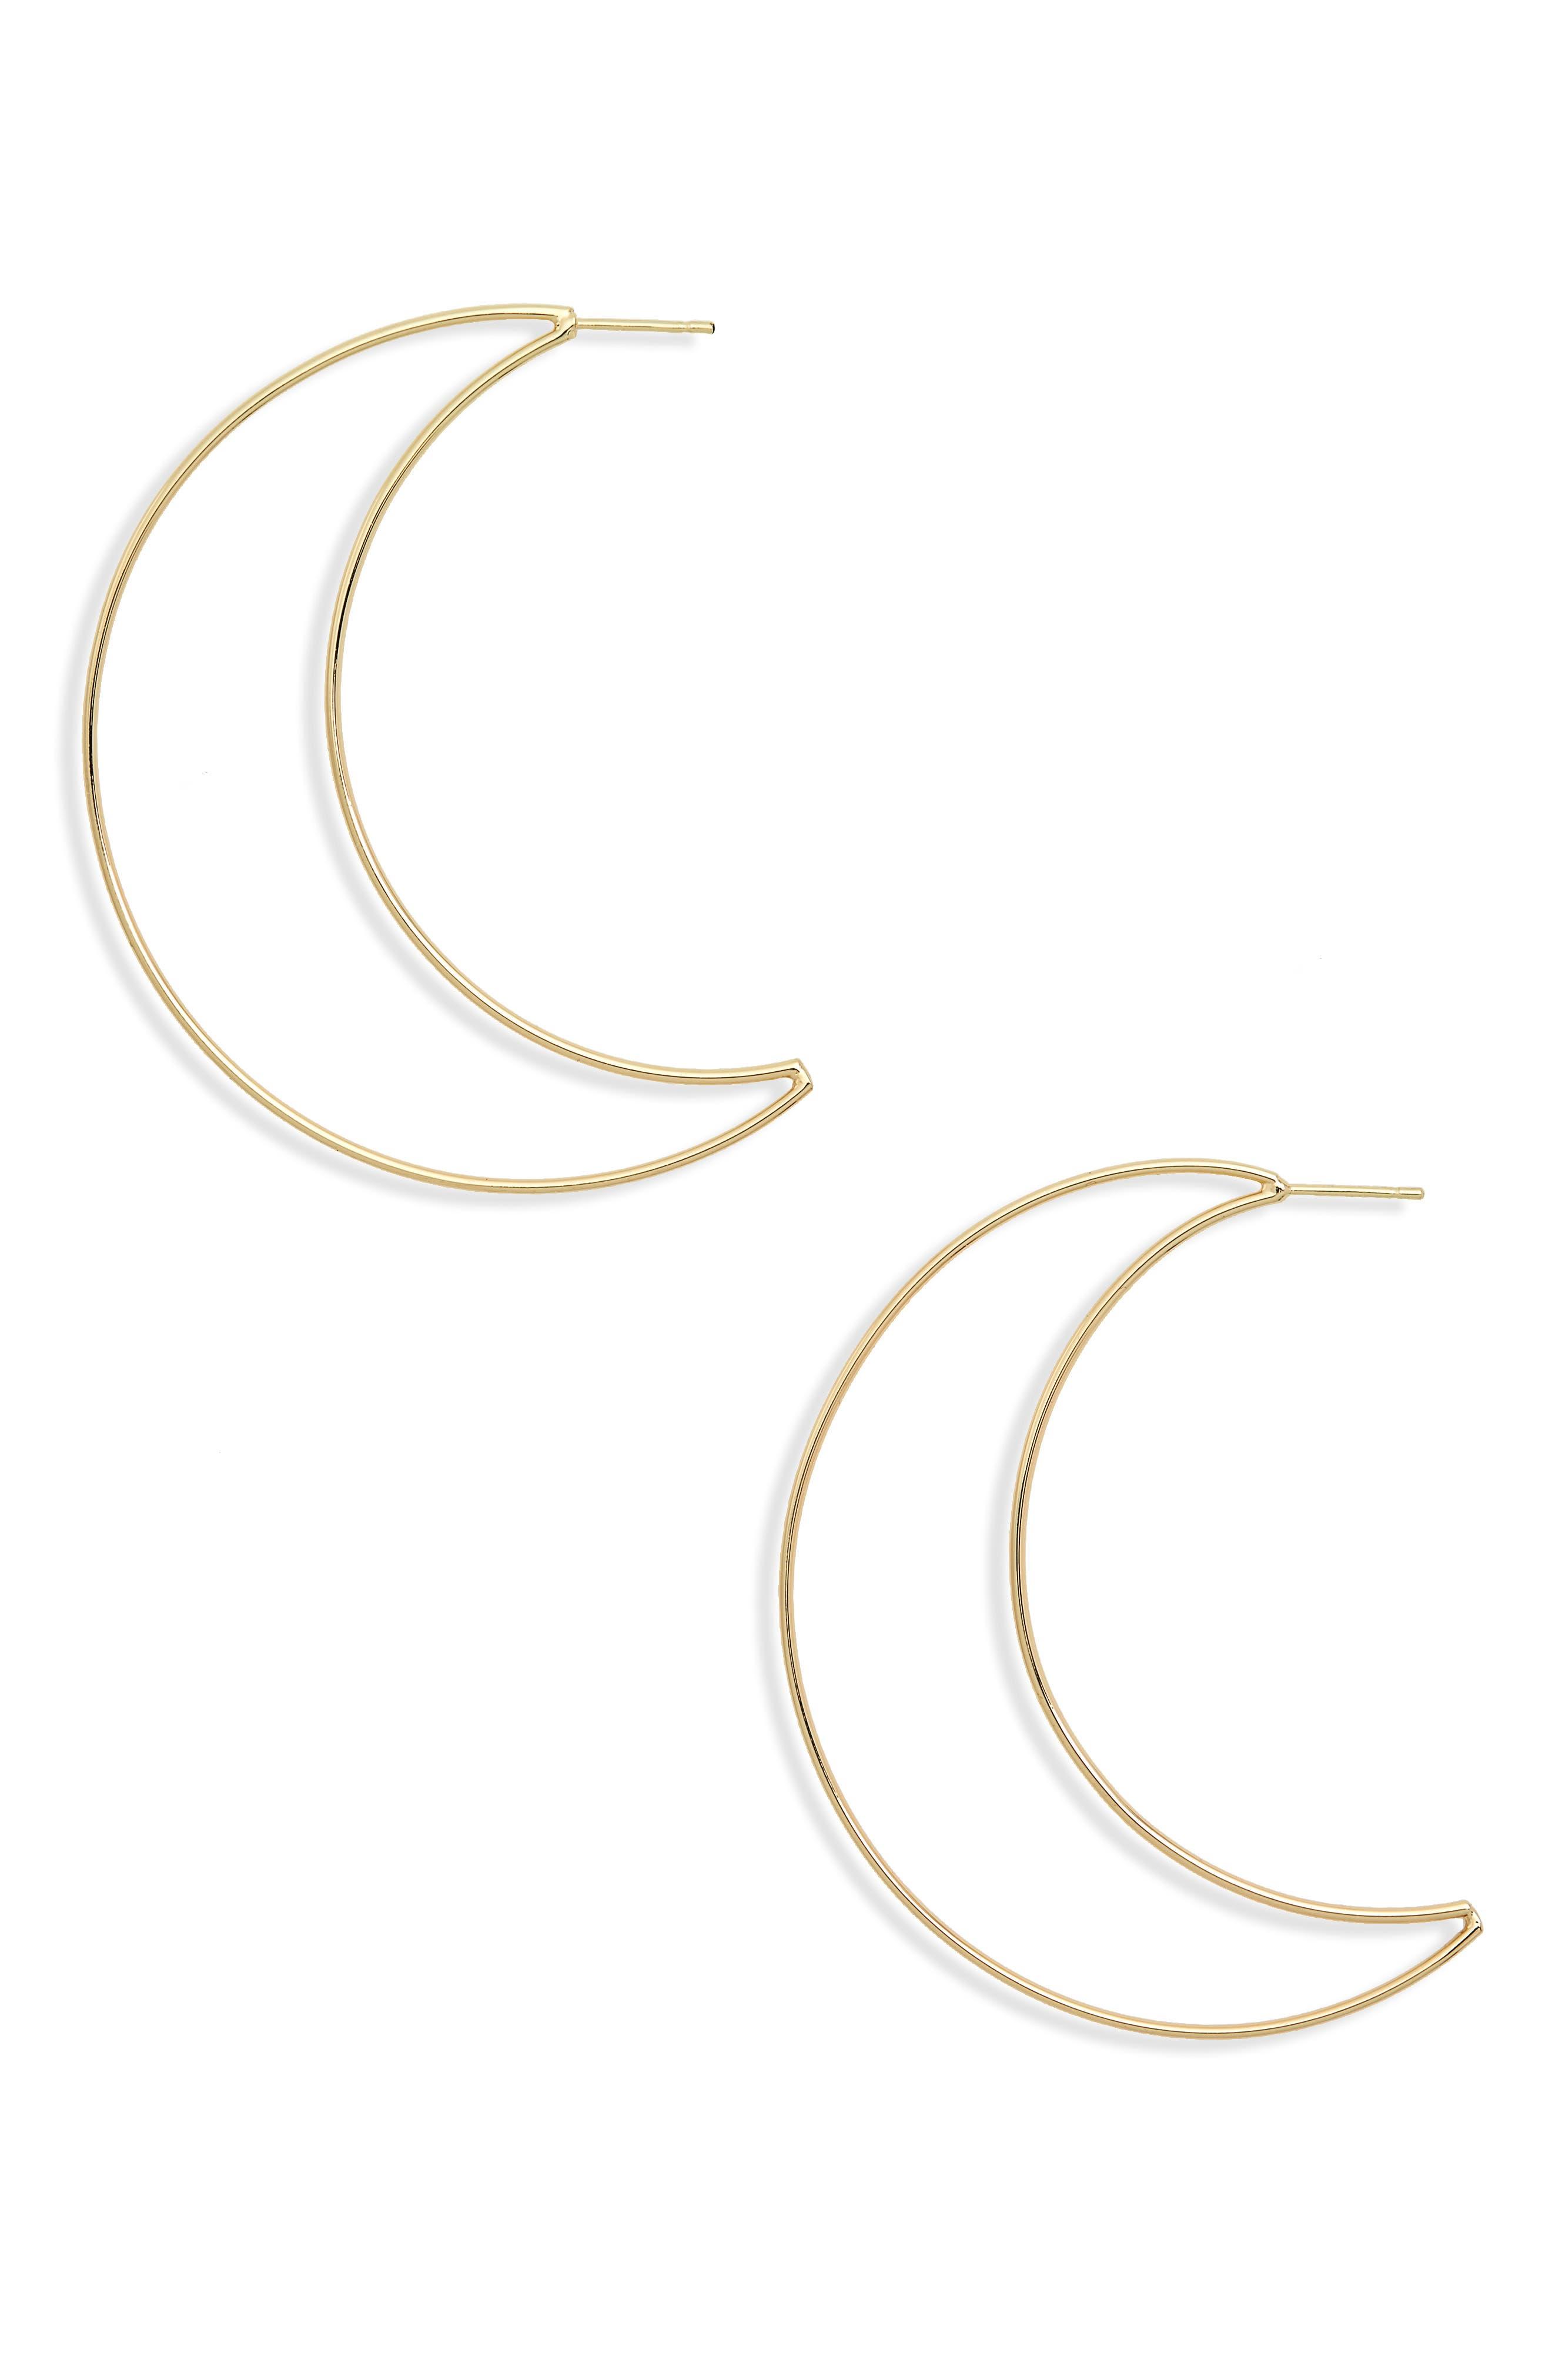 Crescent Hoop Earrings,                             Main thumbnail 1, color,                             710